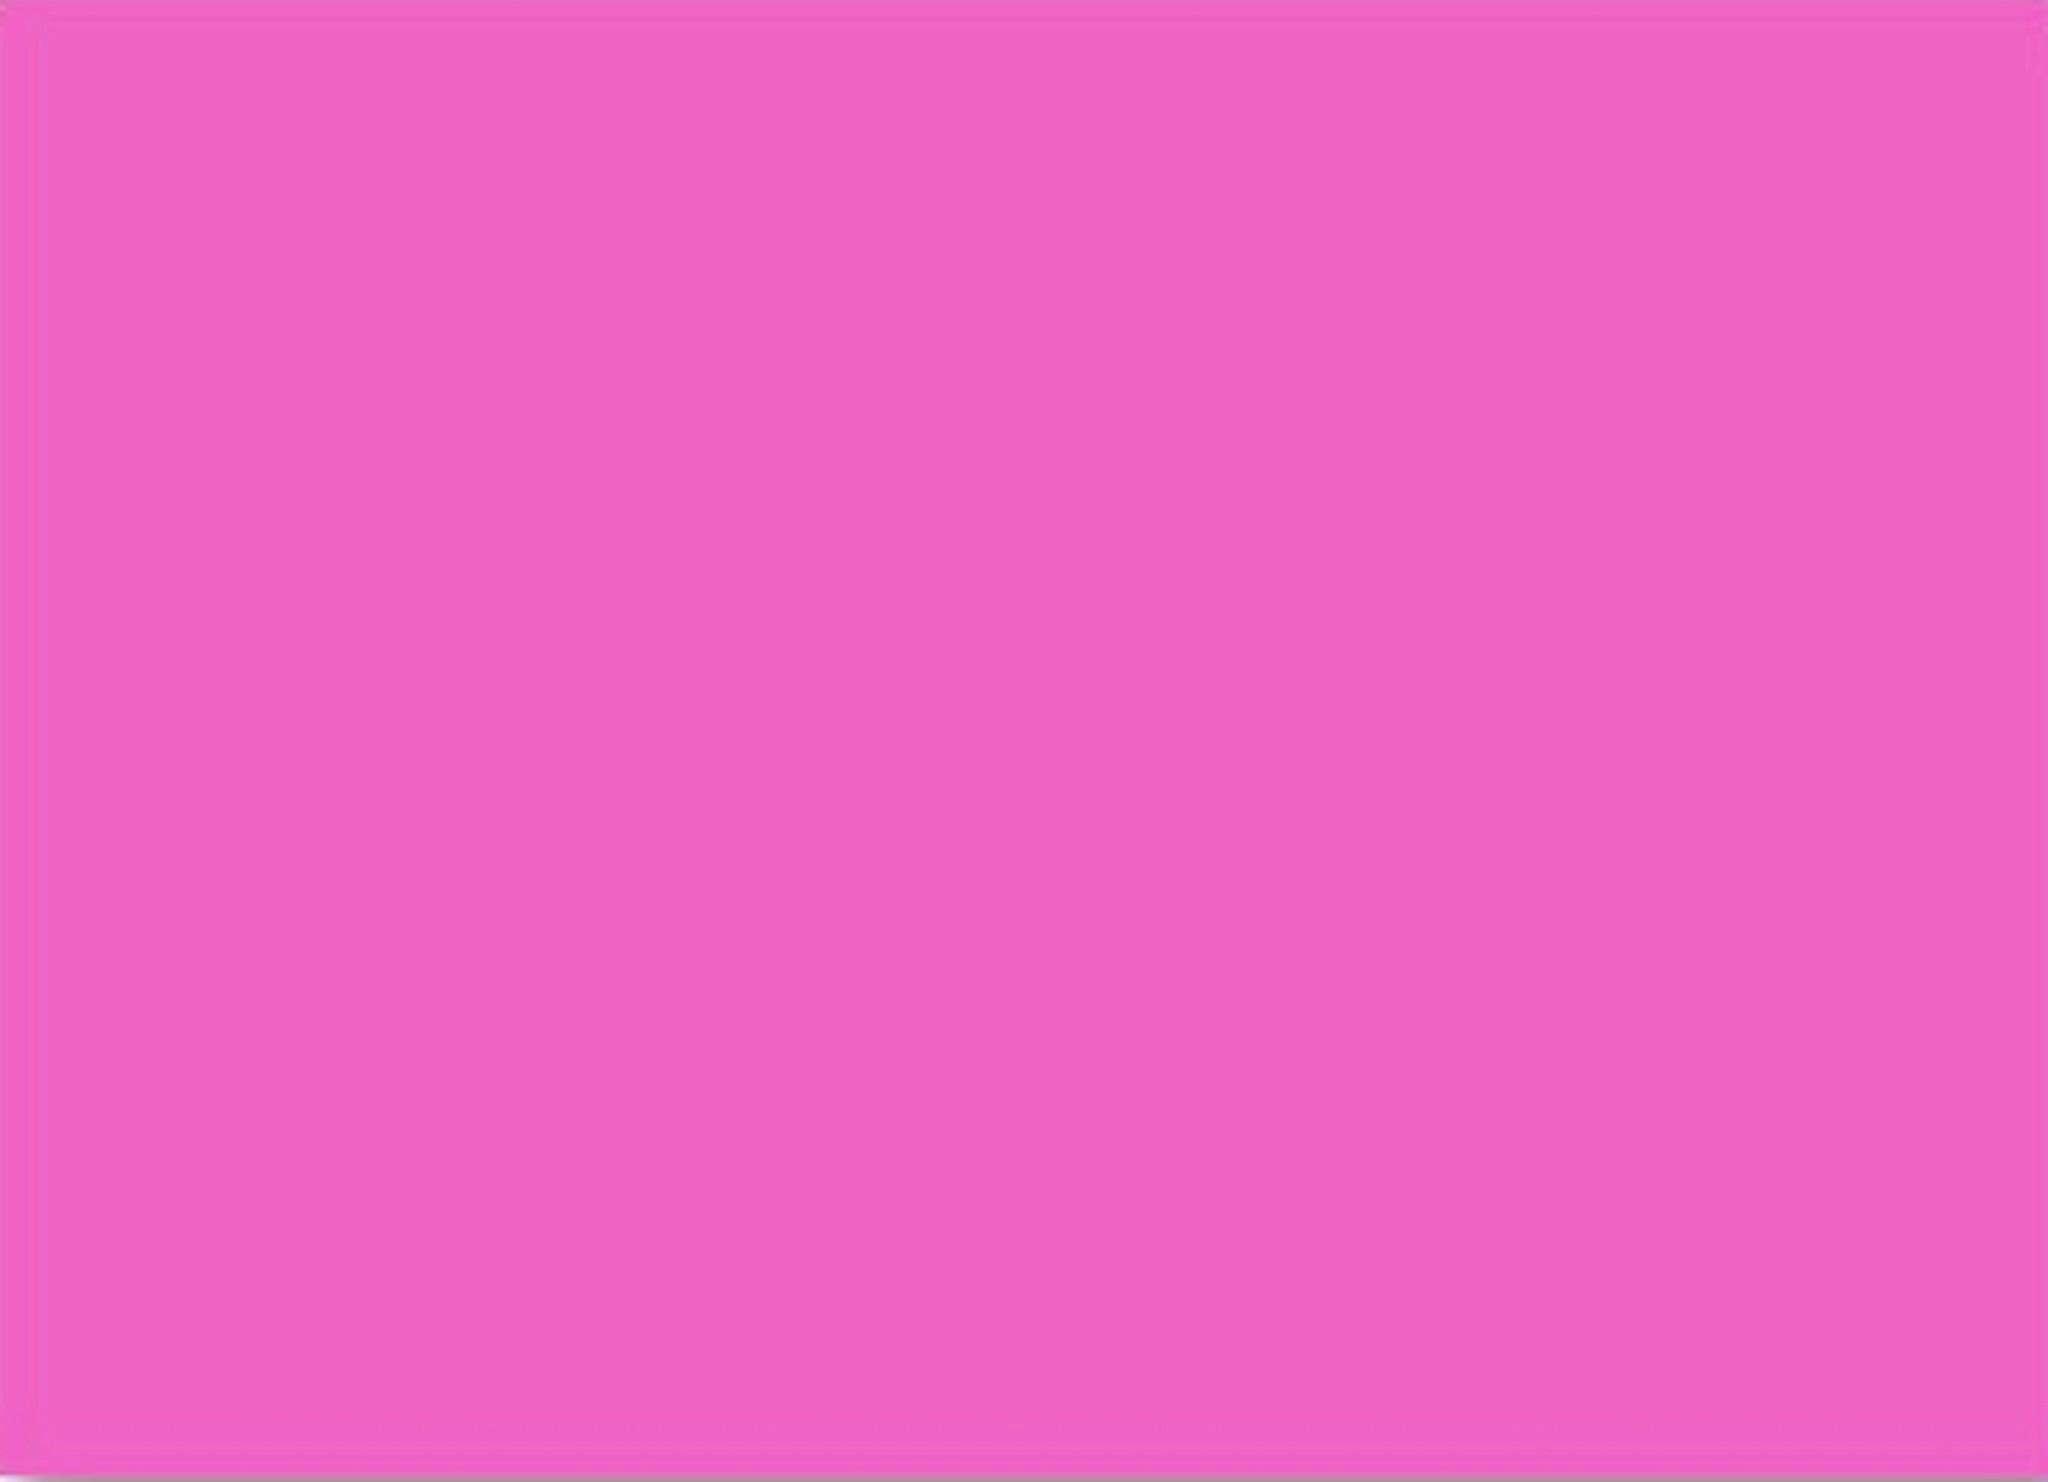 Plain Neon Pink Backgrounds For - plain neon pinkPlain Neon Blue Wallpaper